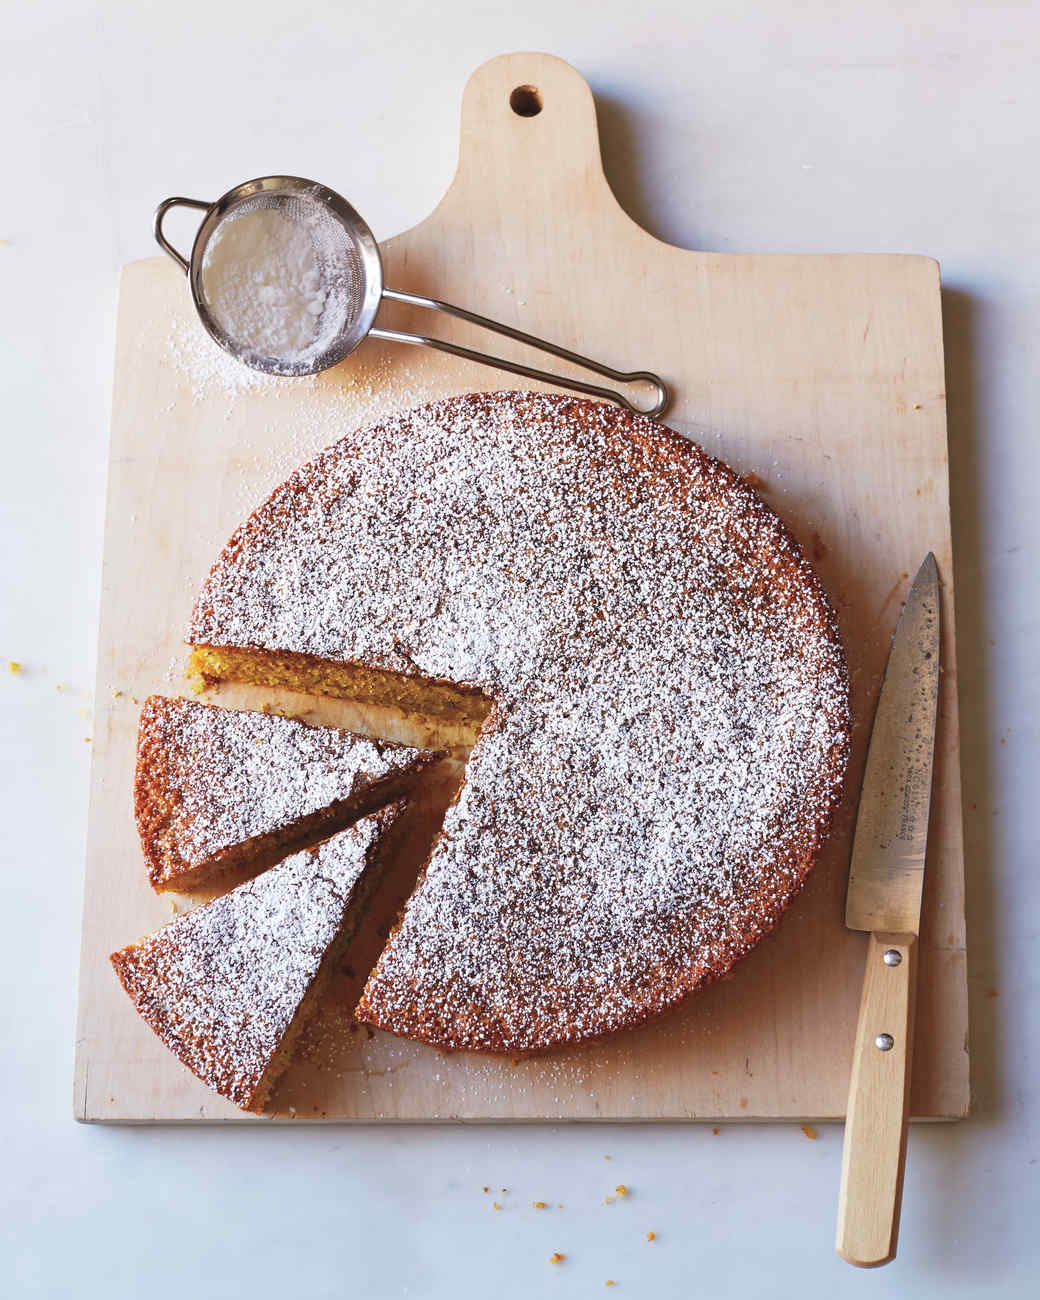 almond-polenta-cake-146-d111738.jpg